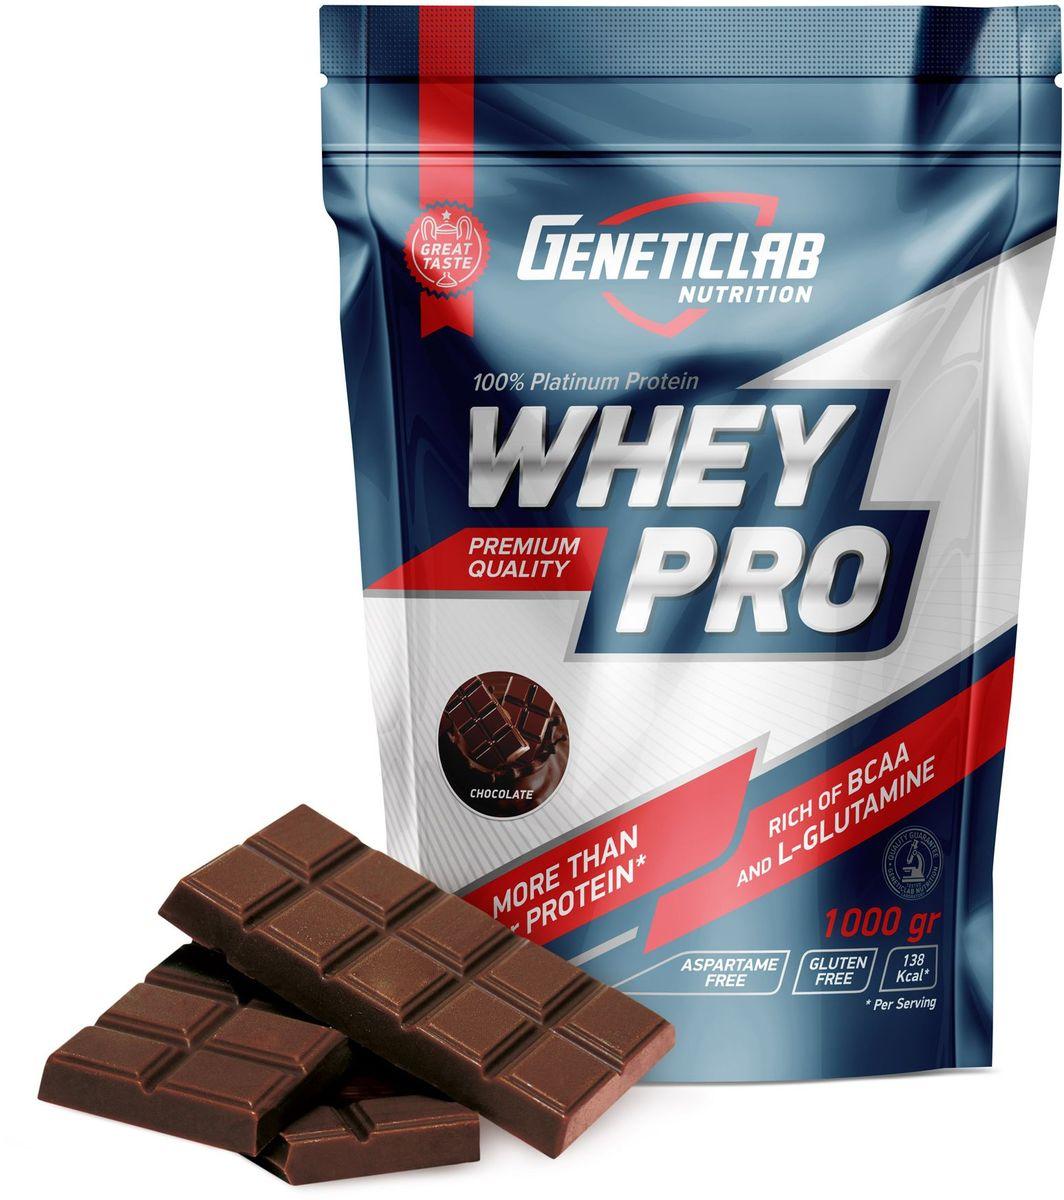 Протеин сывороточный Geneticlab Whey Pro, шоколад, 1 кг сывороточный протеин bbb whey classic шоколад 70% белка и bcaa 1 кг